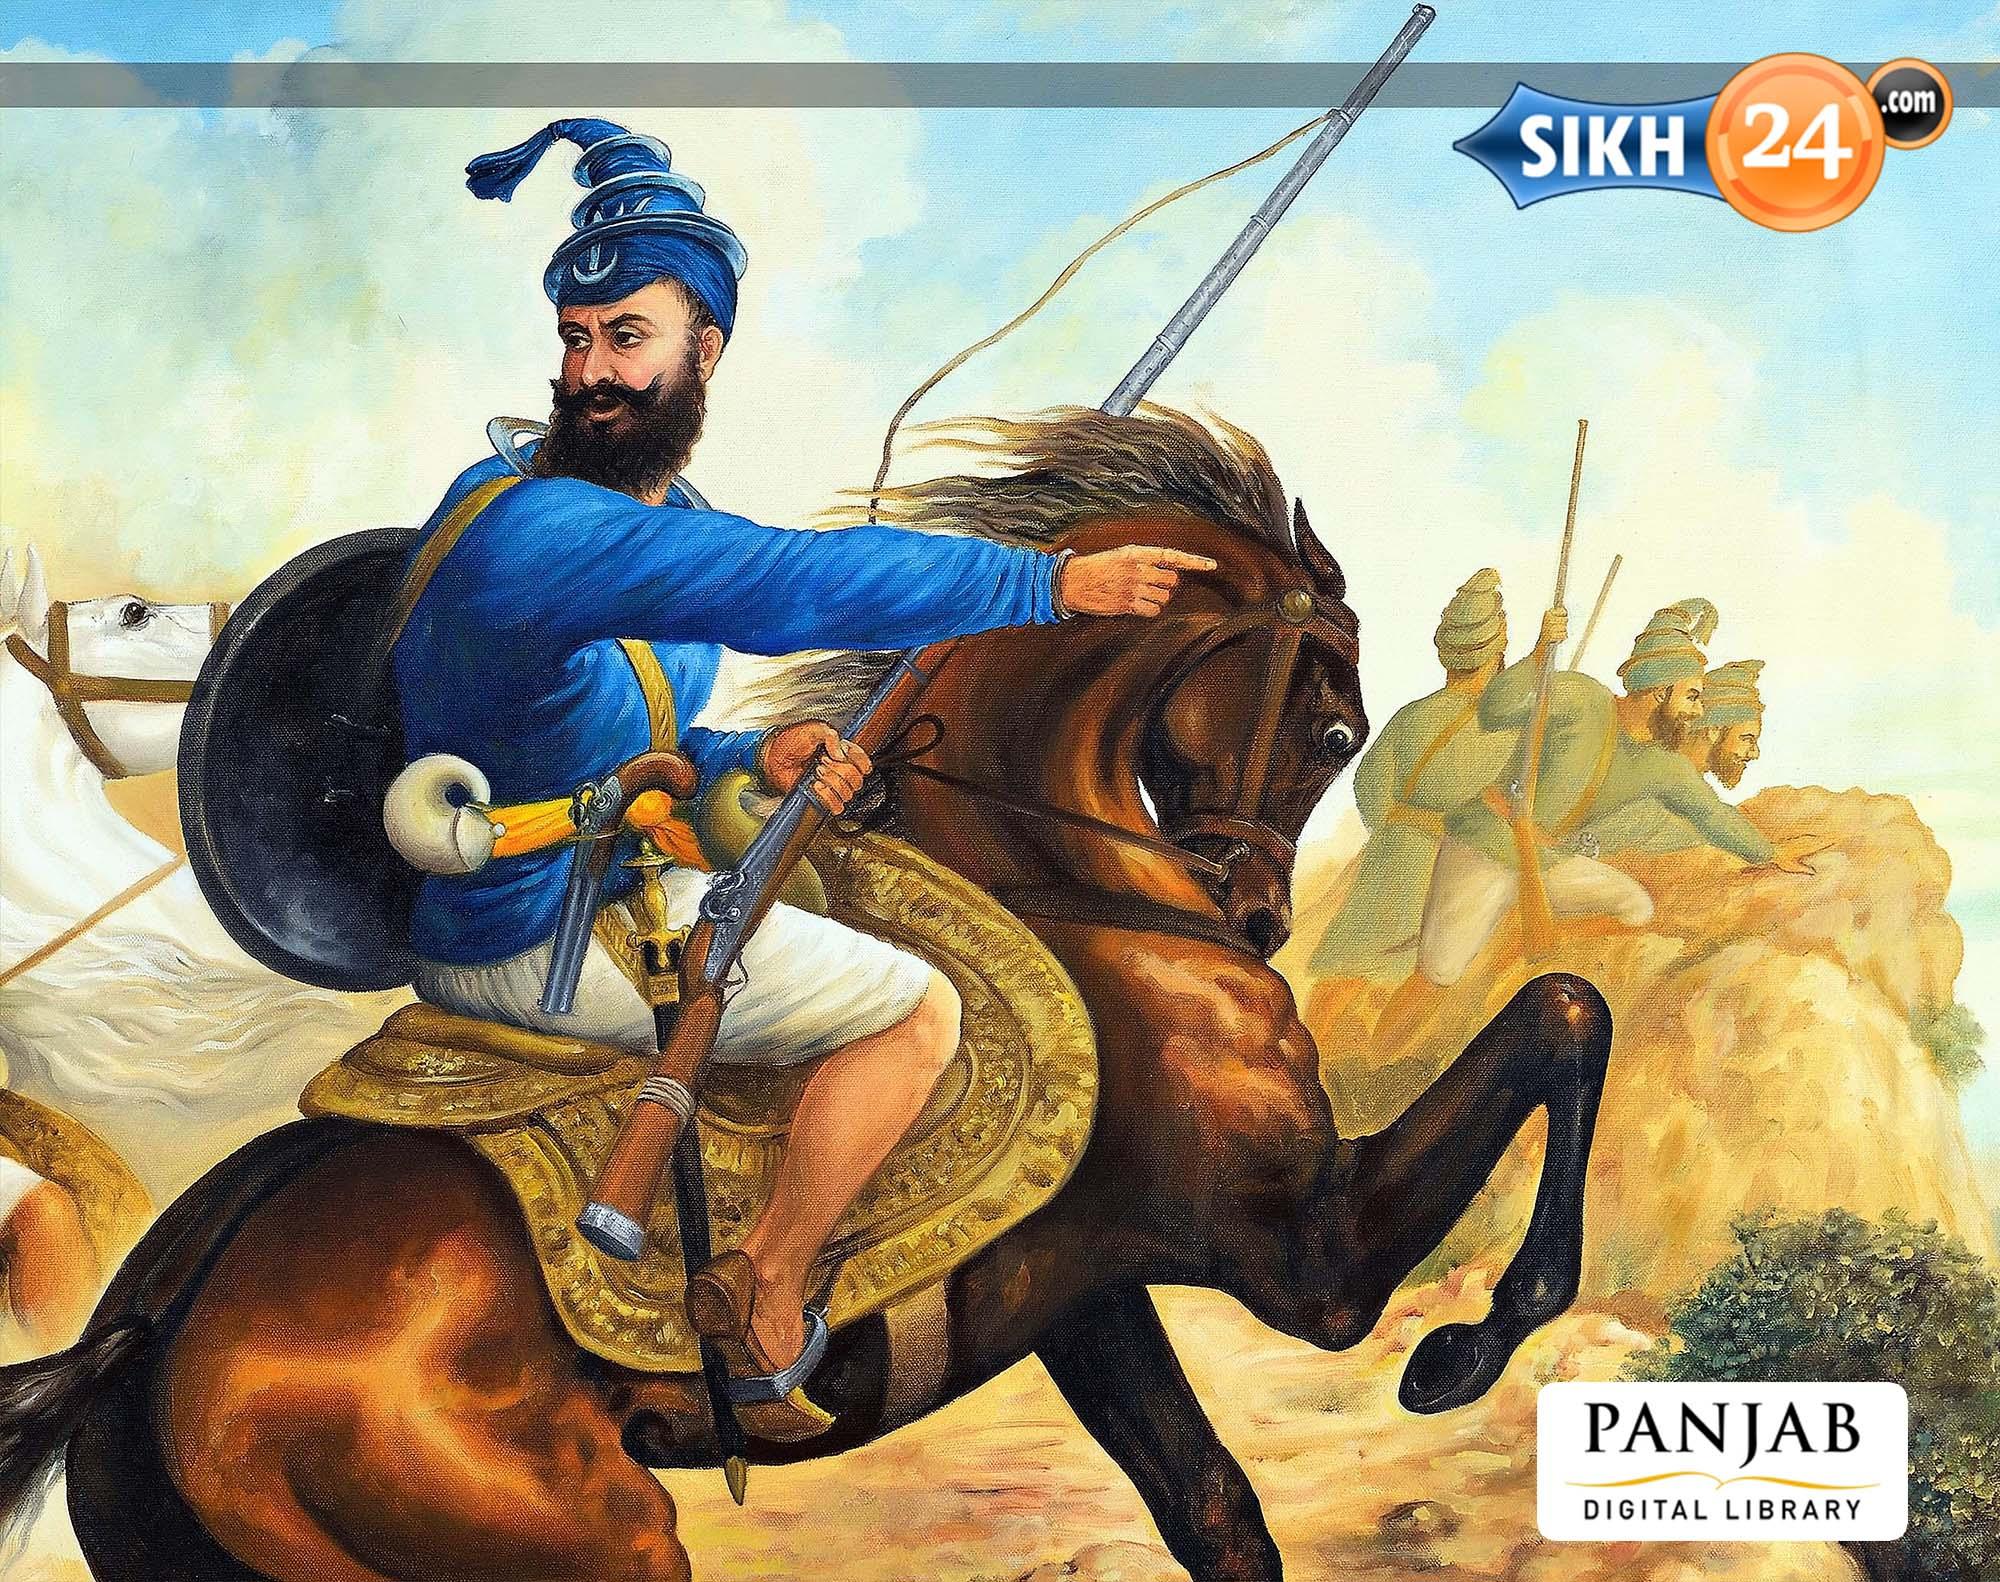 Patna Sahib Exhibition For Guru Gobind Singhs 350th Anniversary To